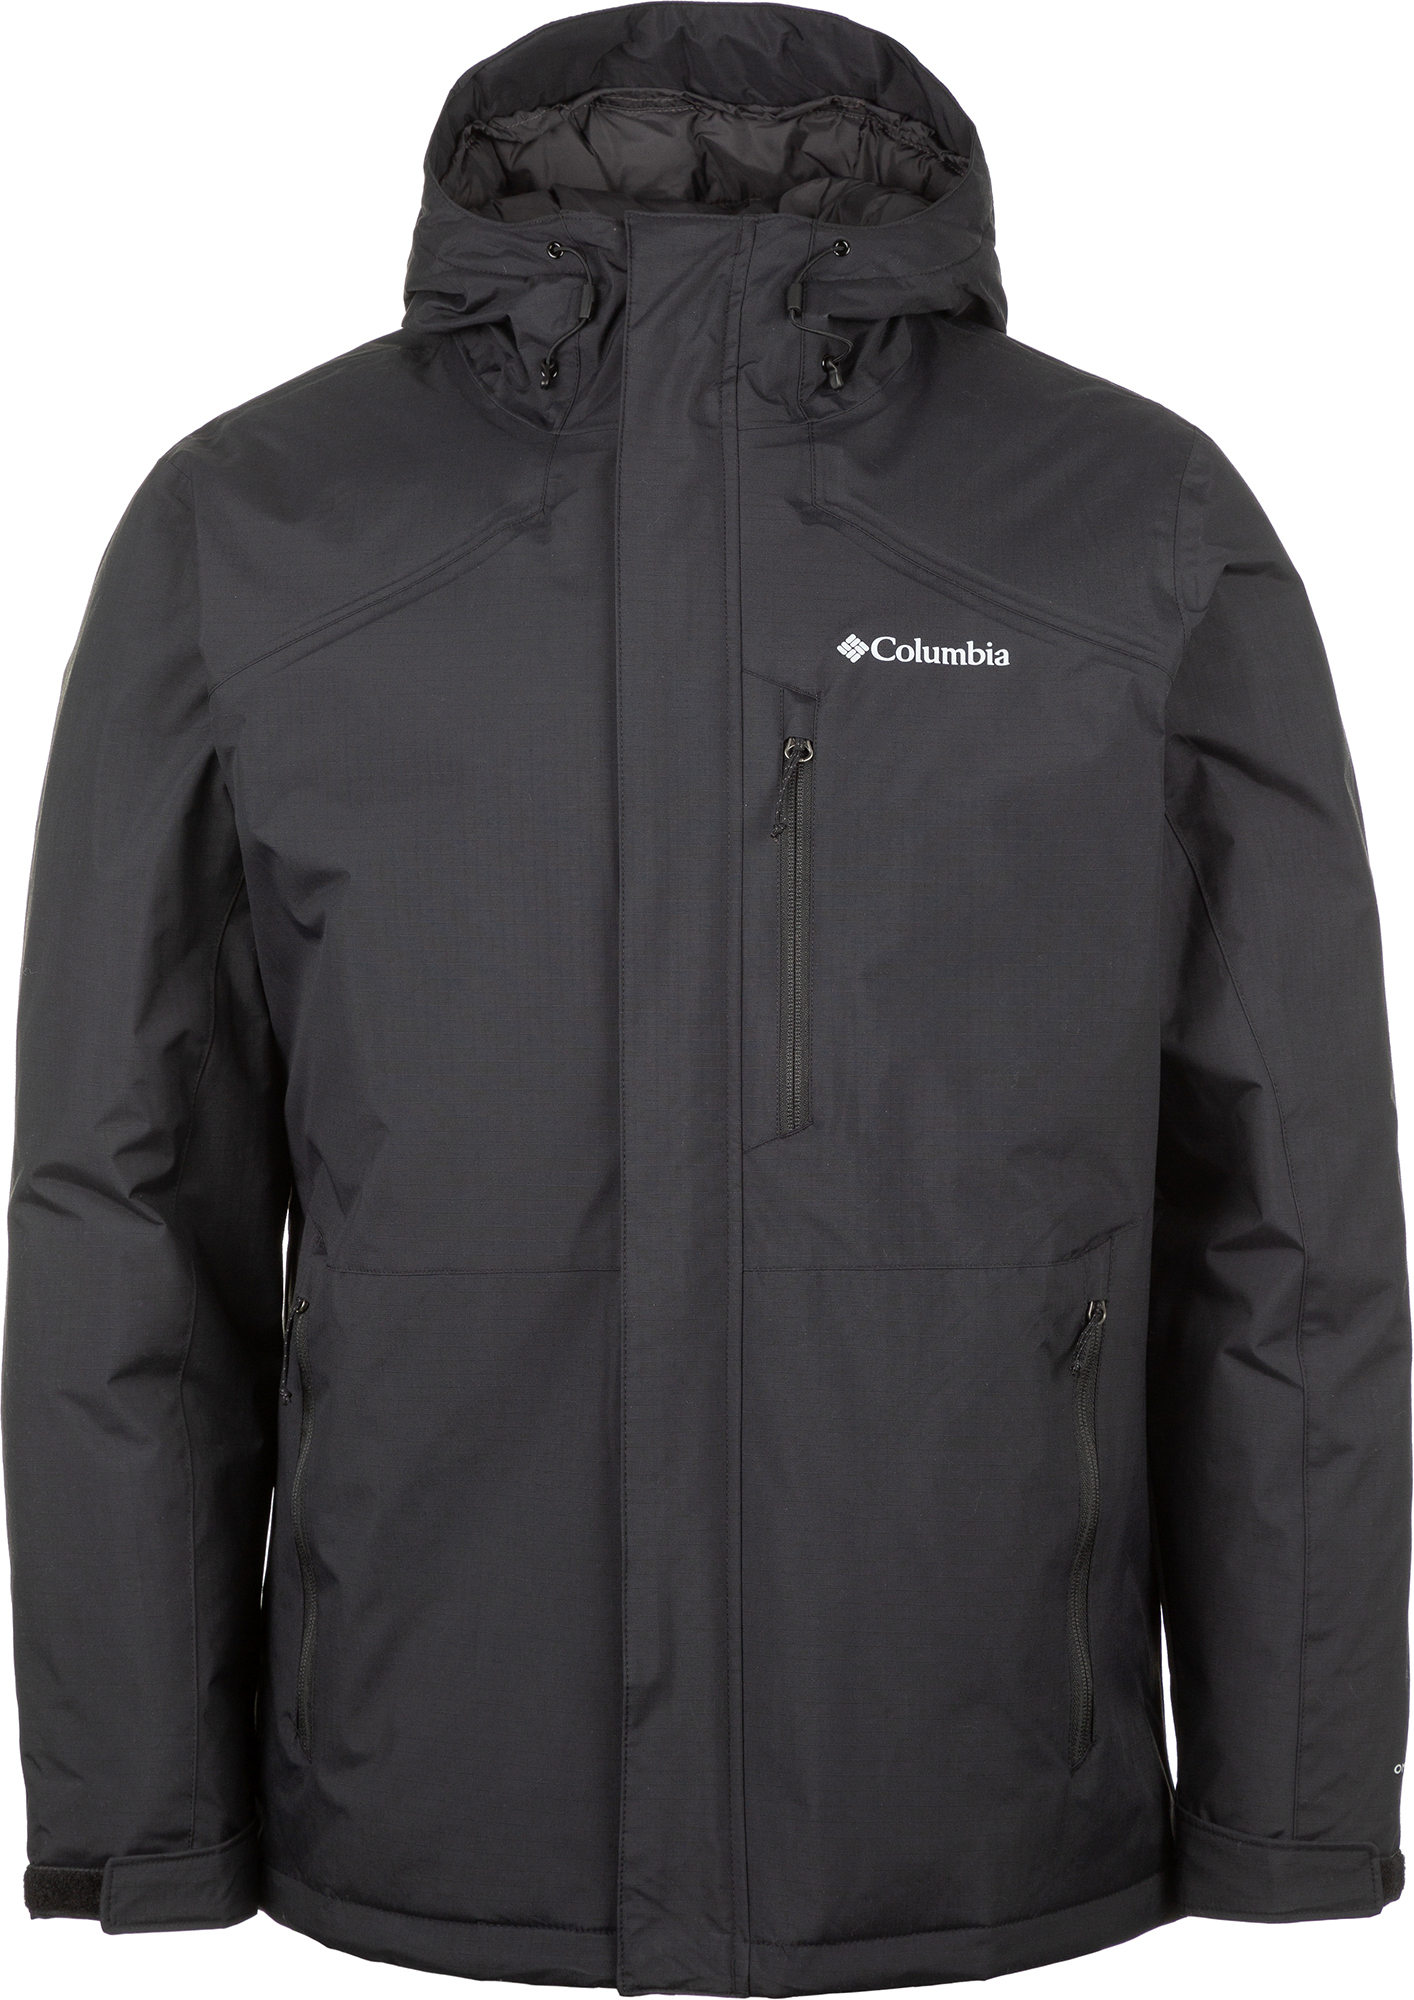 цена Columbia Куртка утепленная мужская Columbia Murr Peak II, размер 54 онлайн в 2017 году